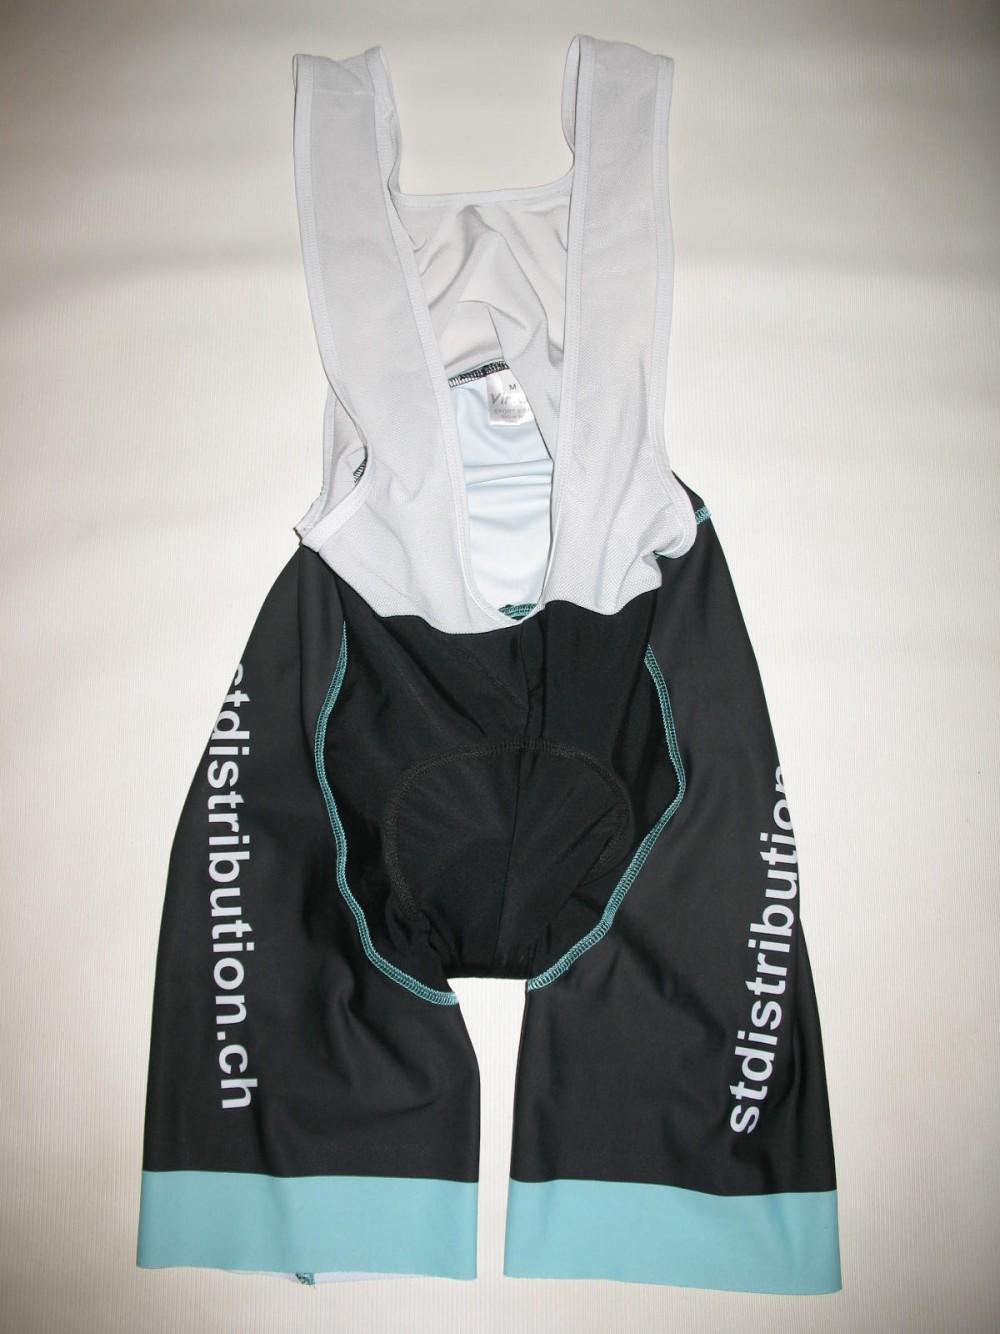 Велошорты VIFRA bib cycling shorts (размер М) - 1